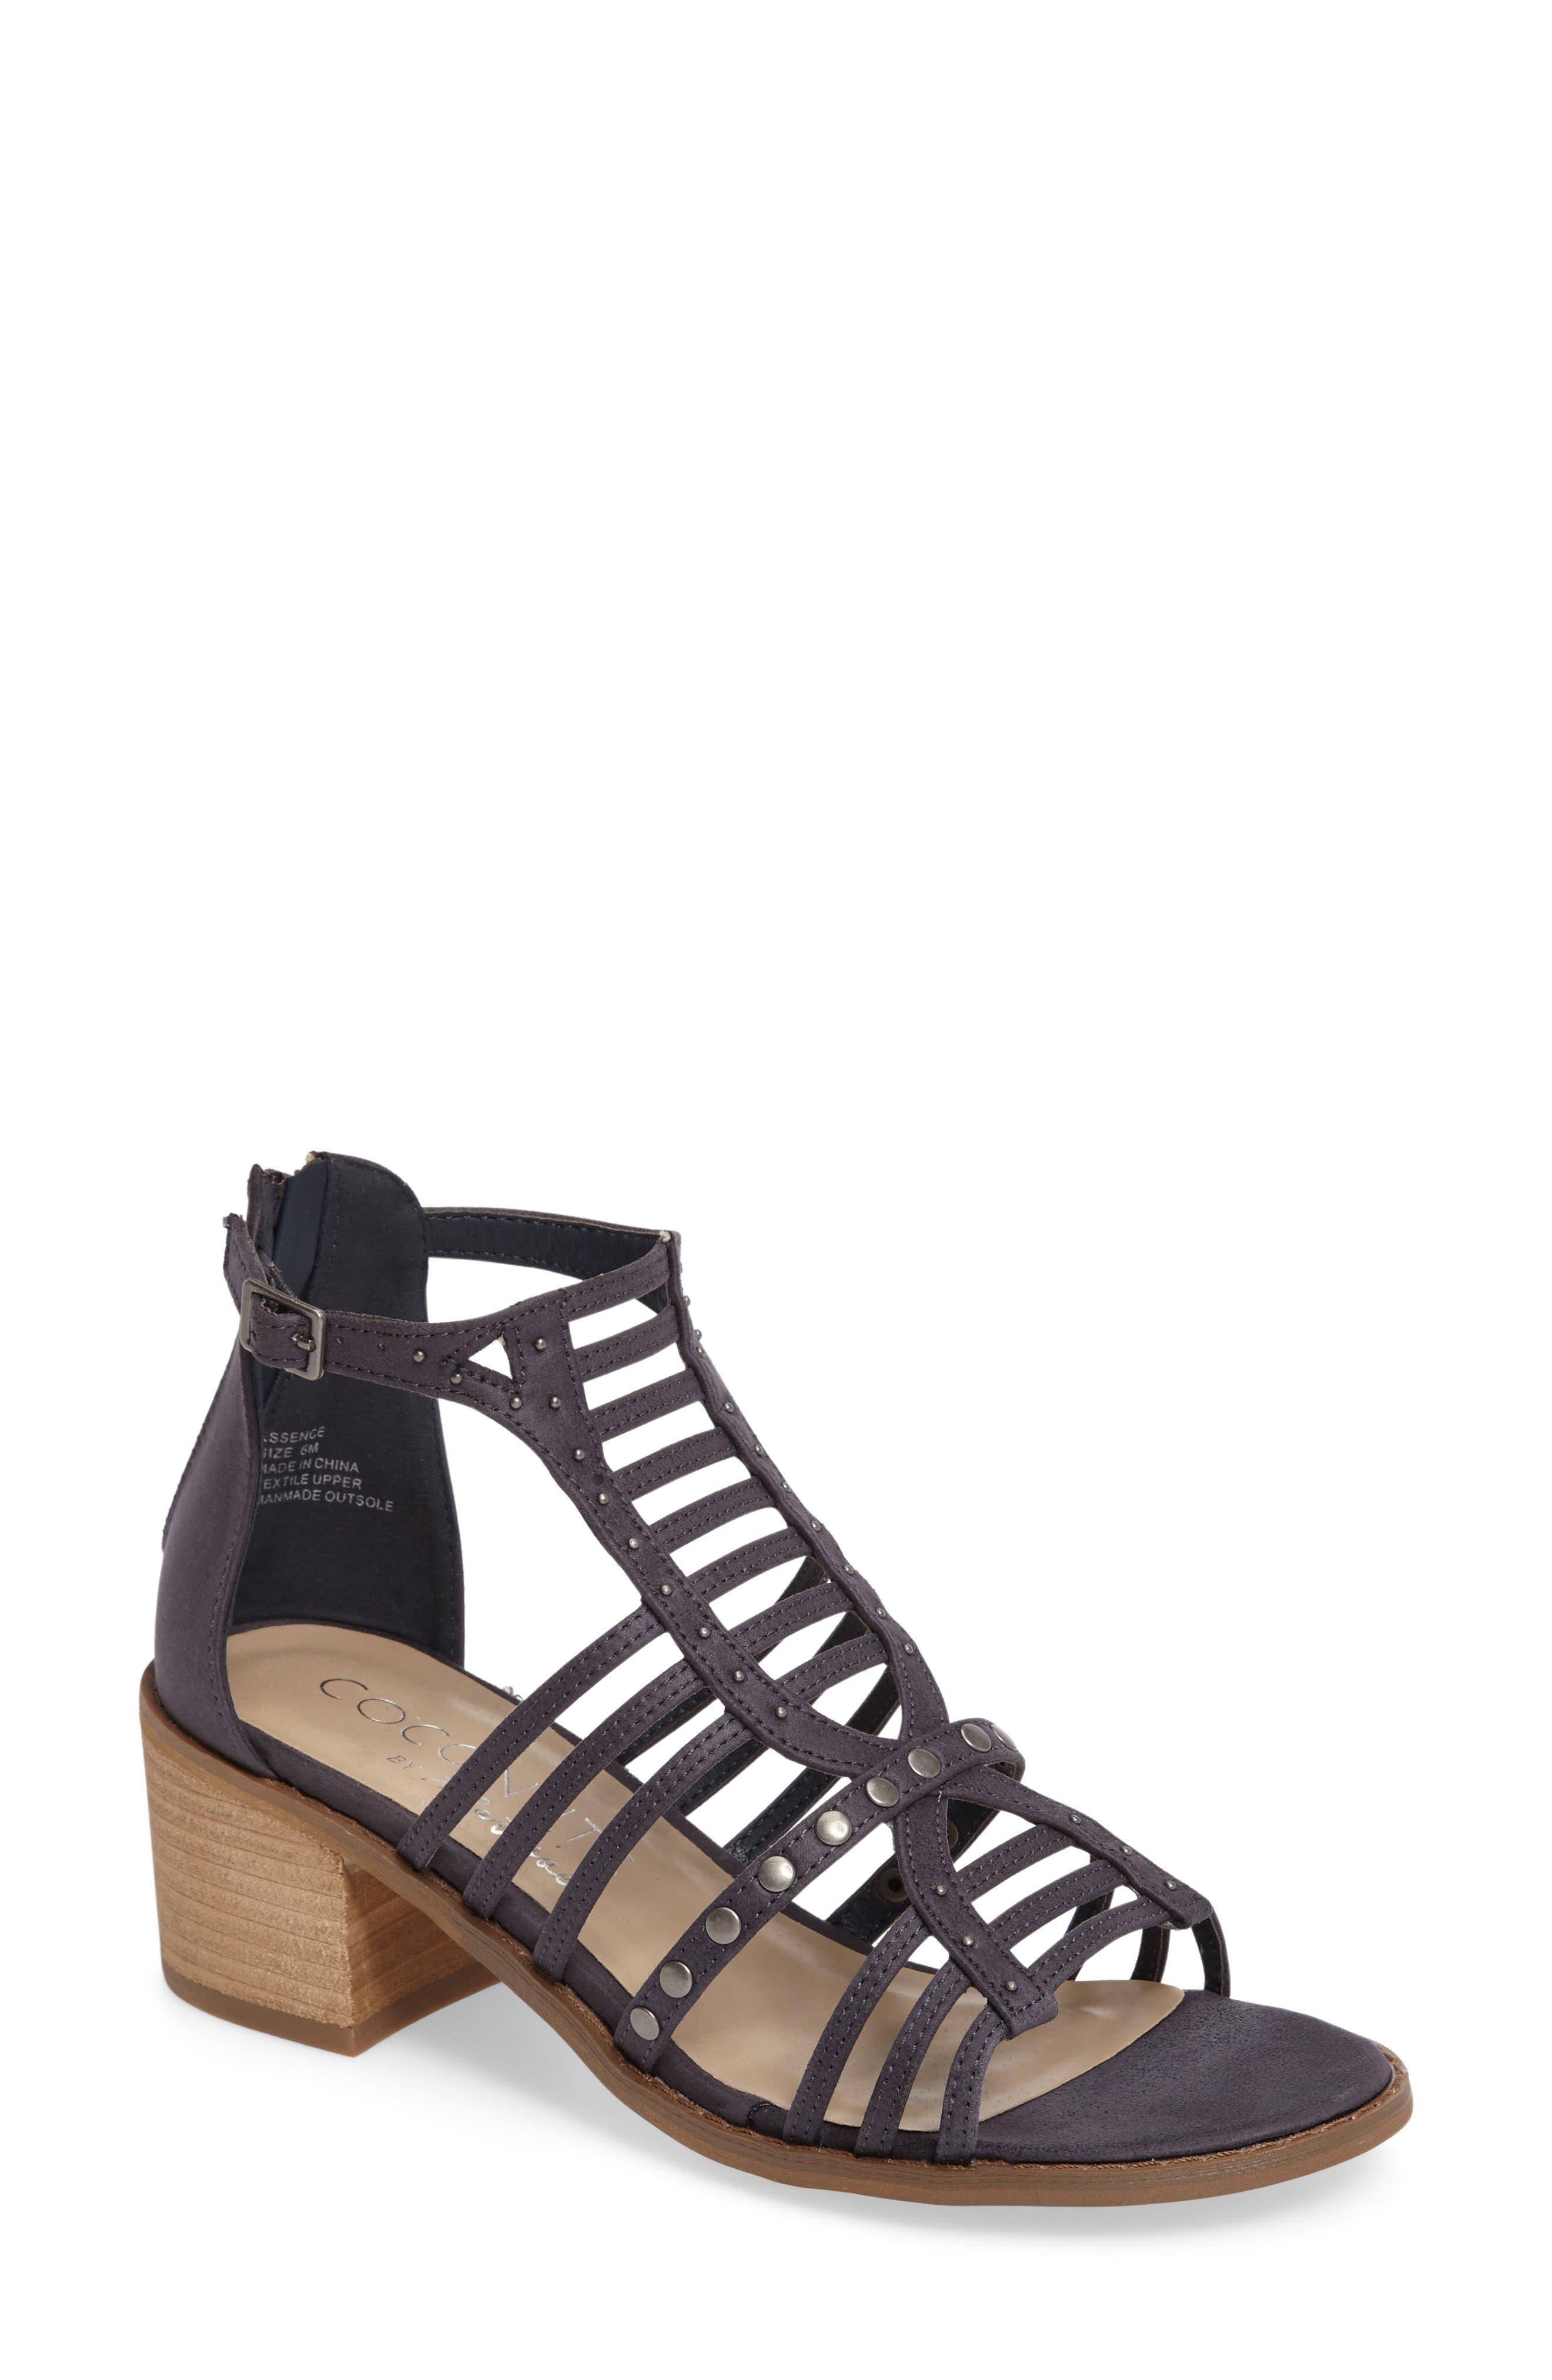 Matisse Essence Sandal,                         Main,                         color,